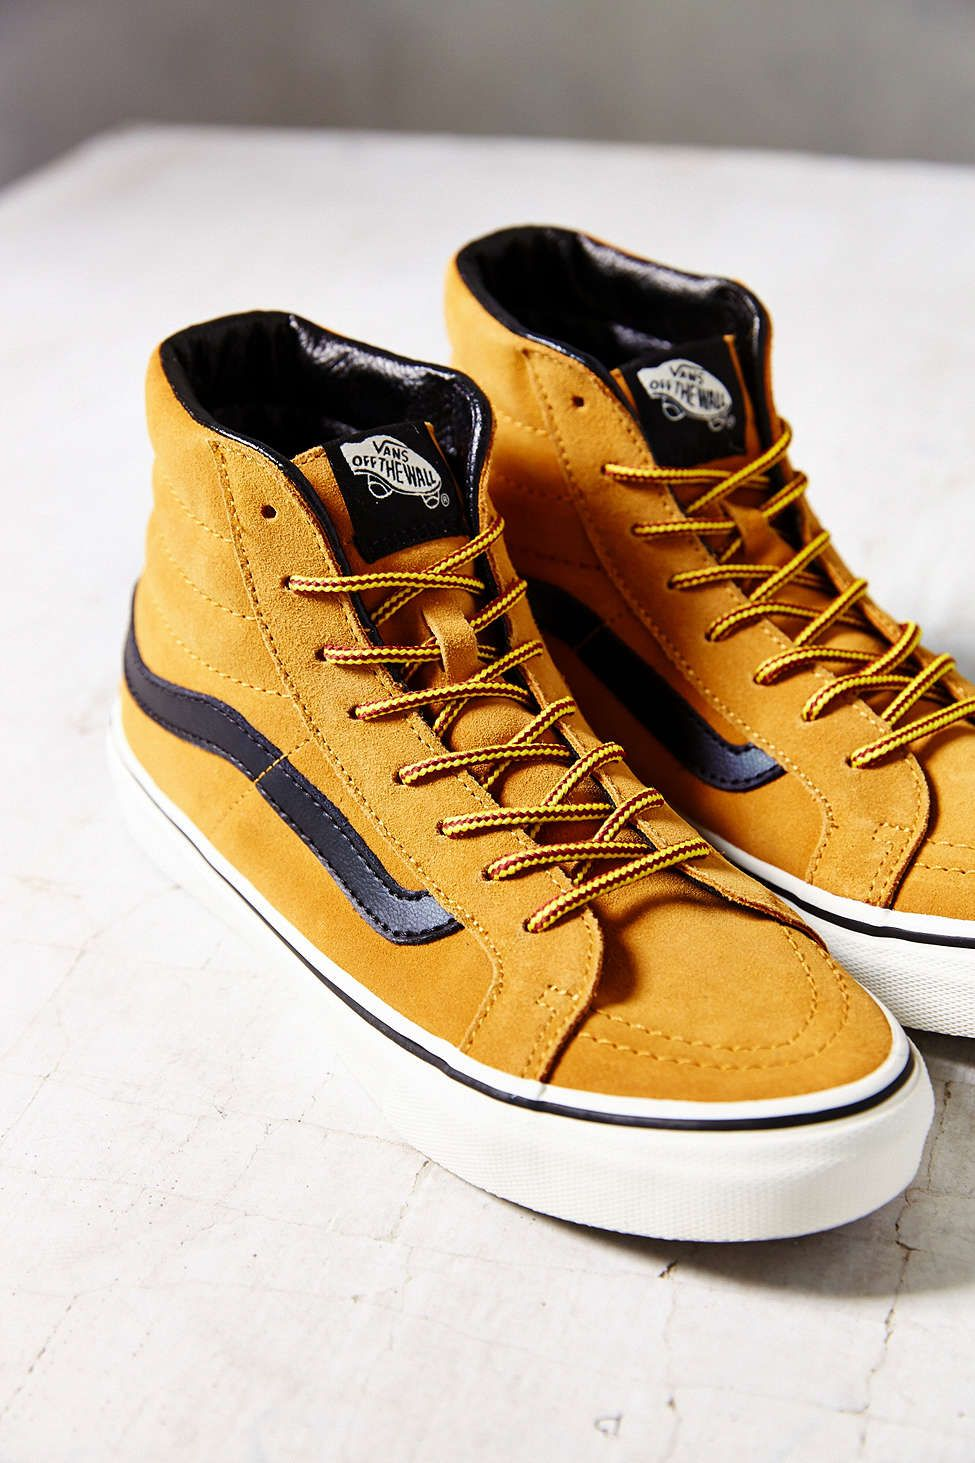 Vans Sk8Hi Slim Hiker Women's Sneaker Vans sk8 hi slim